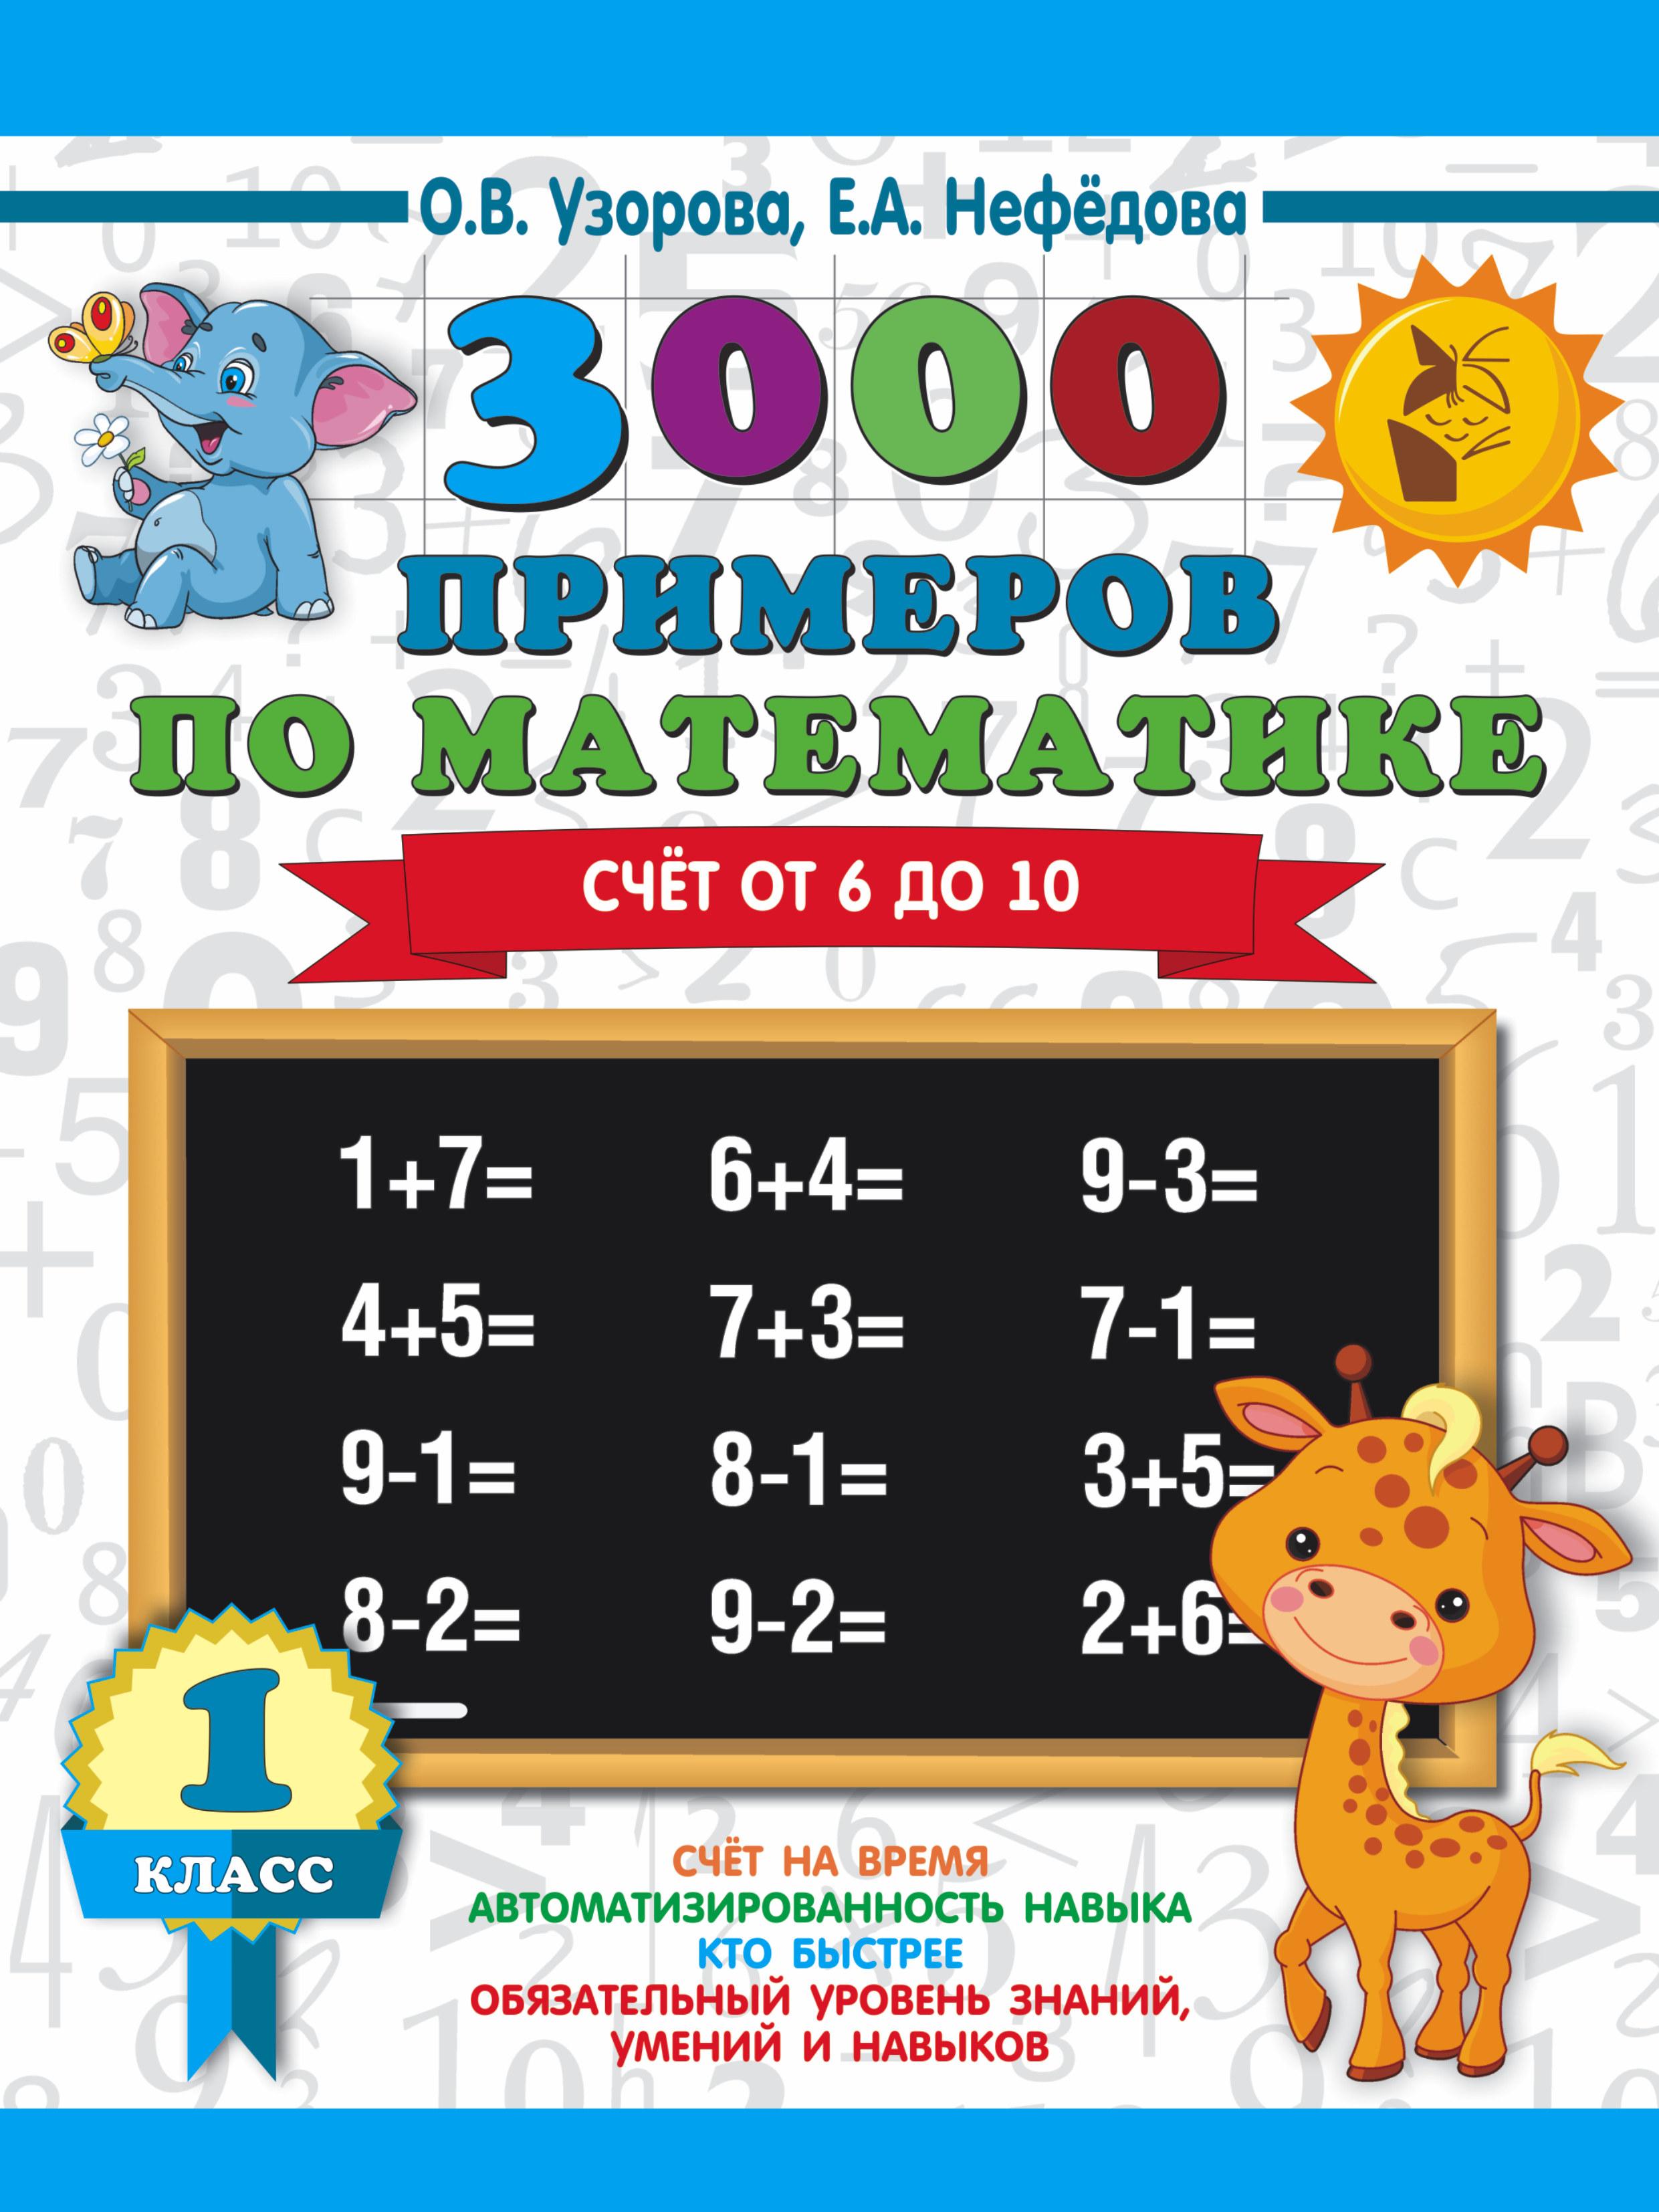 3000 примеров по математике. Счёт от 6 до 10. 1 класс ( Узорова Ольга Васильевна, Нефедова Елена Алексеевна  )